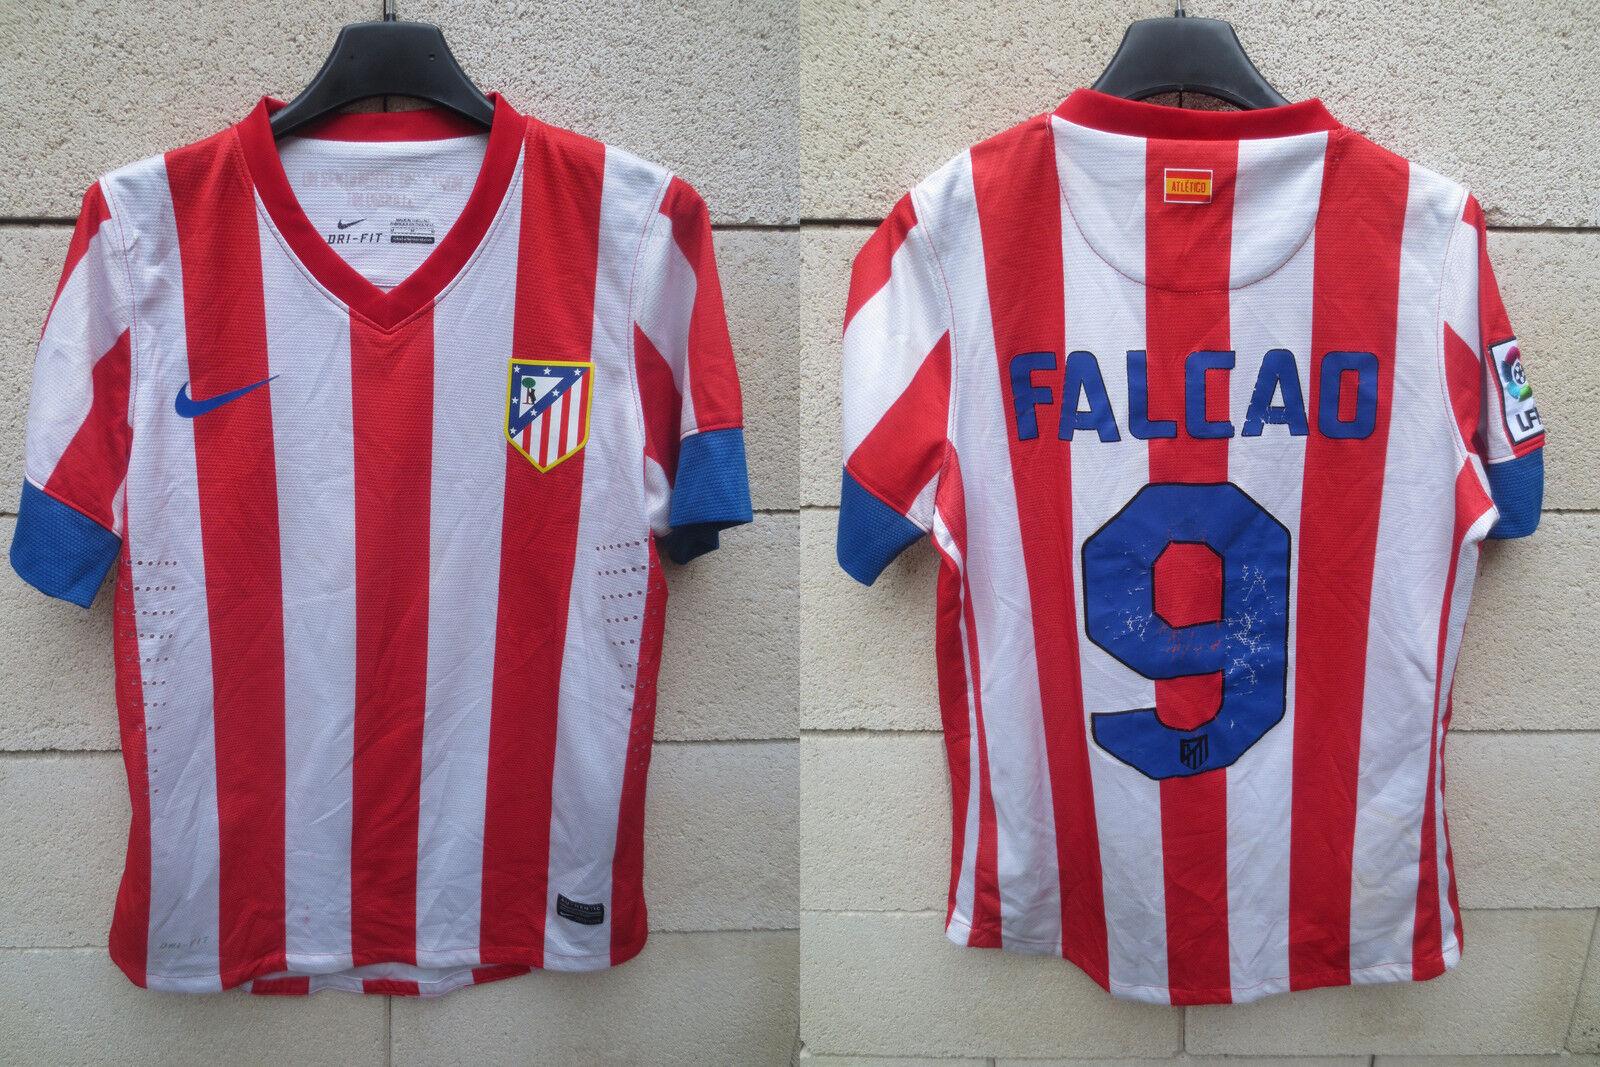 d467be1fe73 Maillot ATLETICO MADRID 2013 NIKE camiseta FALCAO n°9 jersey shirt football  M